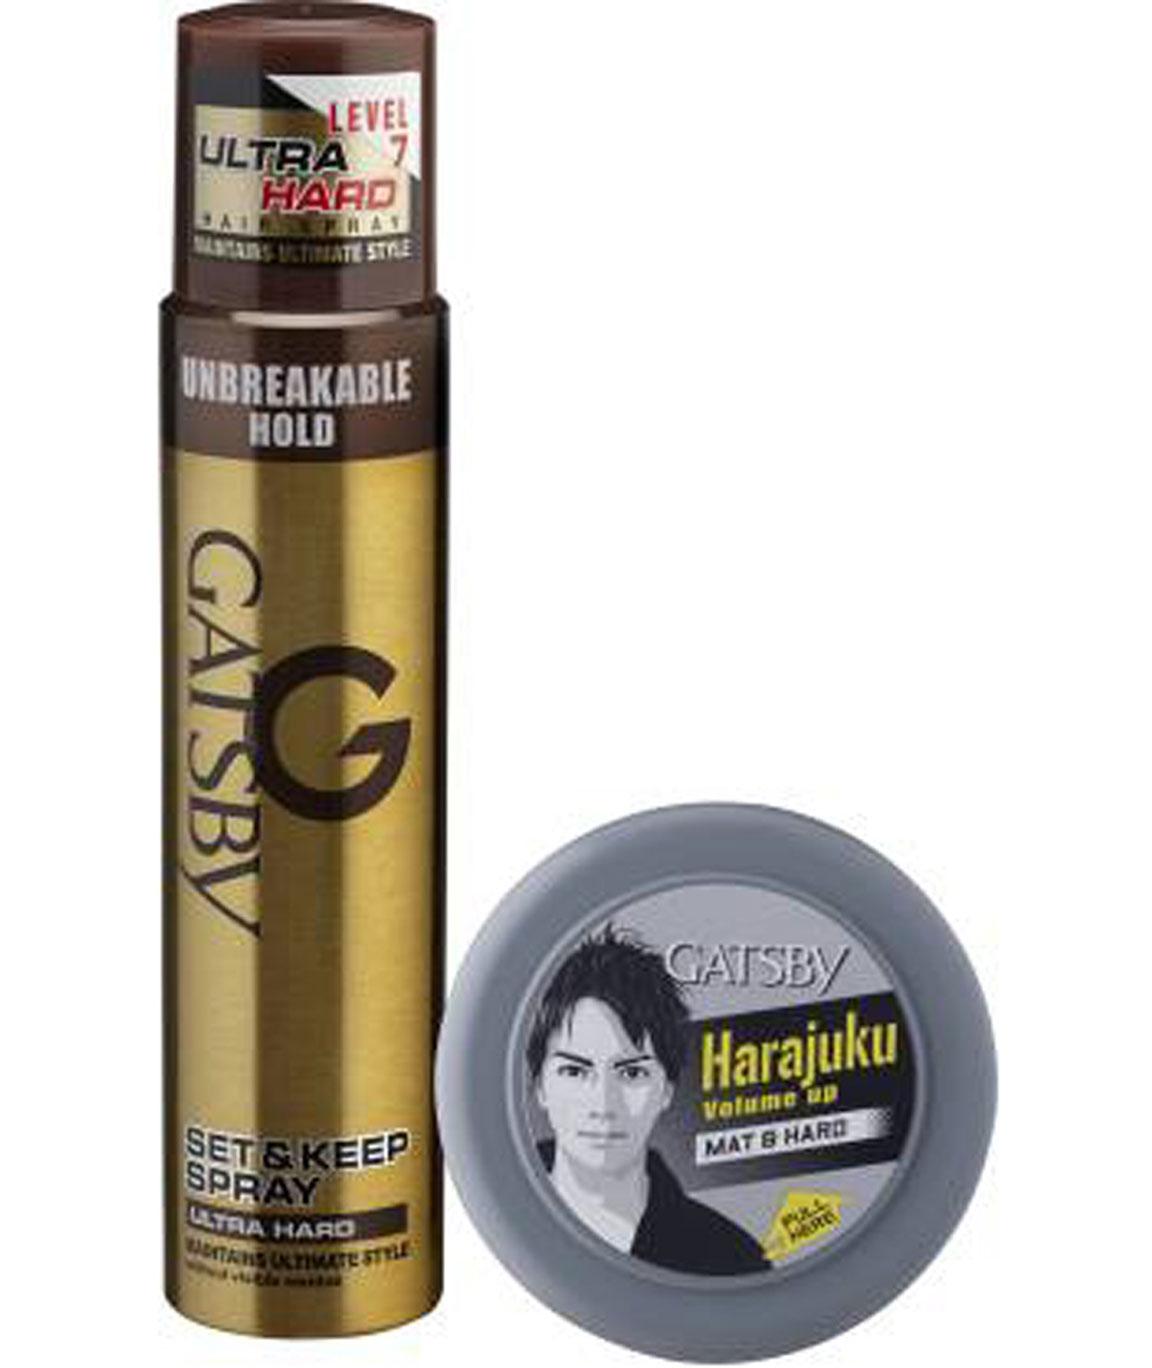 GATSBY SET & KEEP HAIR SPRAY ULTRA HARD 250 ML WITH HAIR STYLING WAX MAT & HARD 75 Gm SPRAY (325 G)